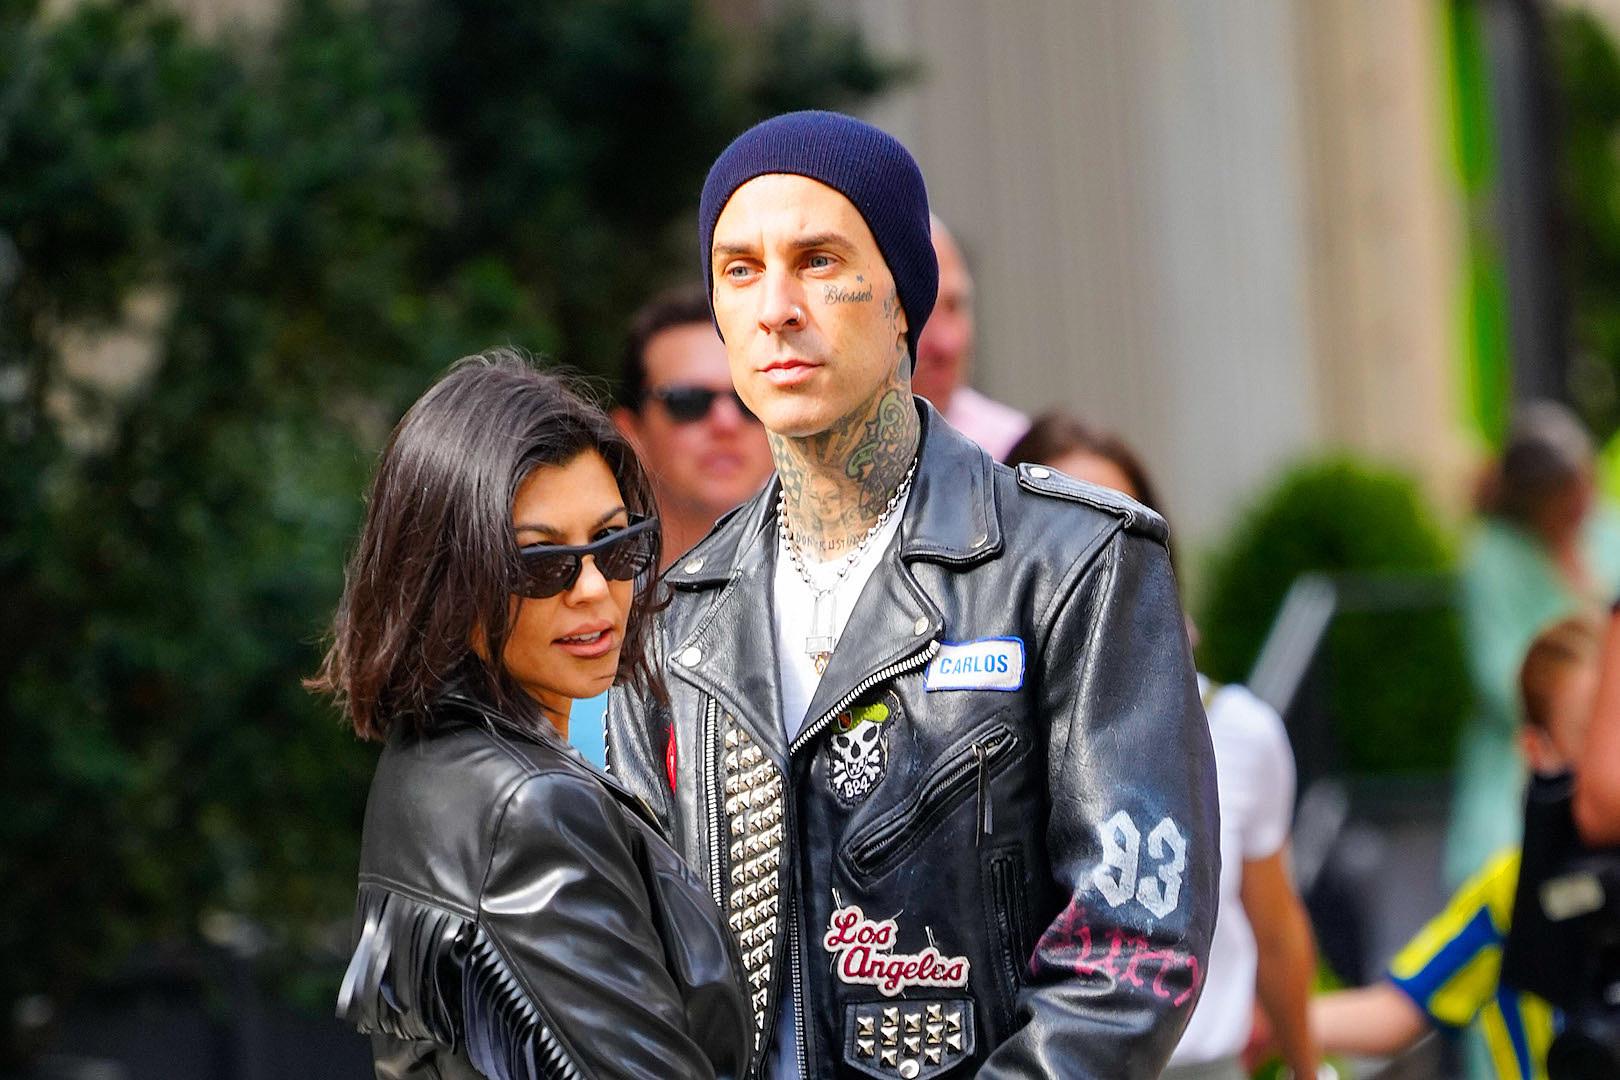 Blink-182's Travis Barker + Kourtney Kardashian Just Got Engaged